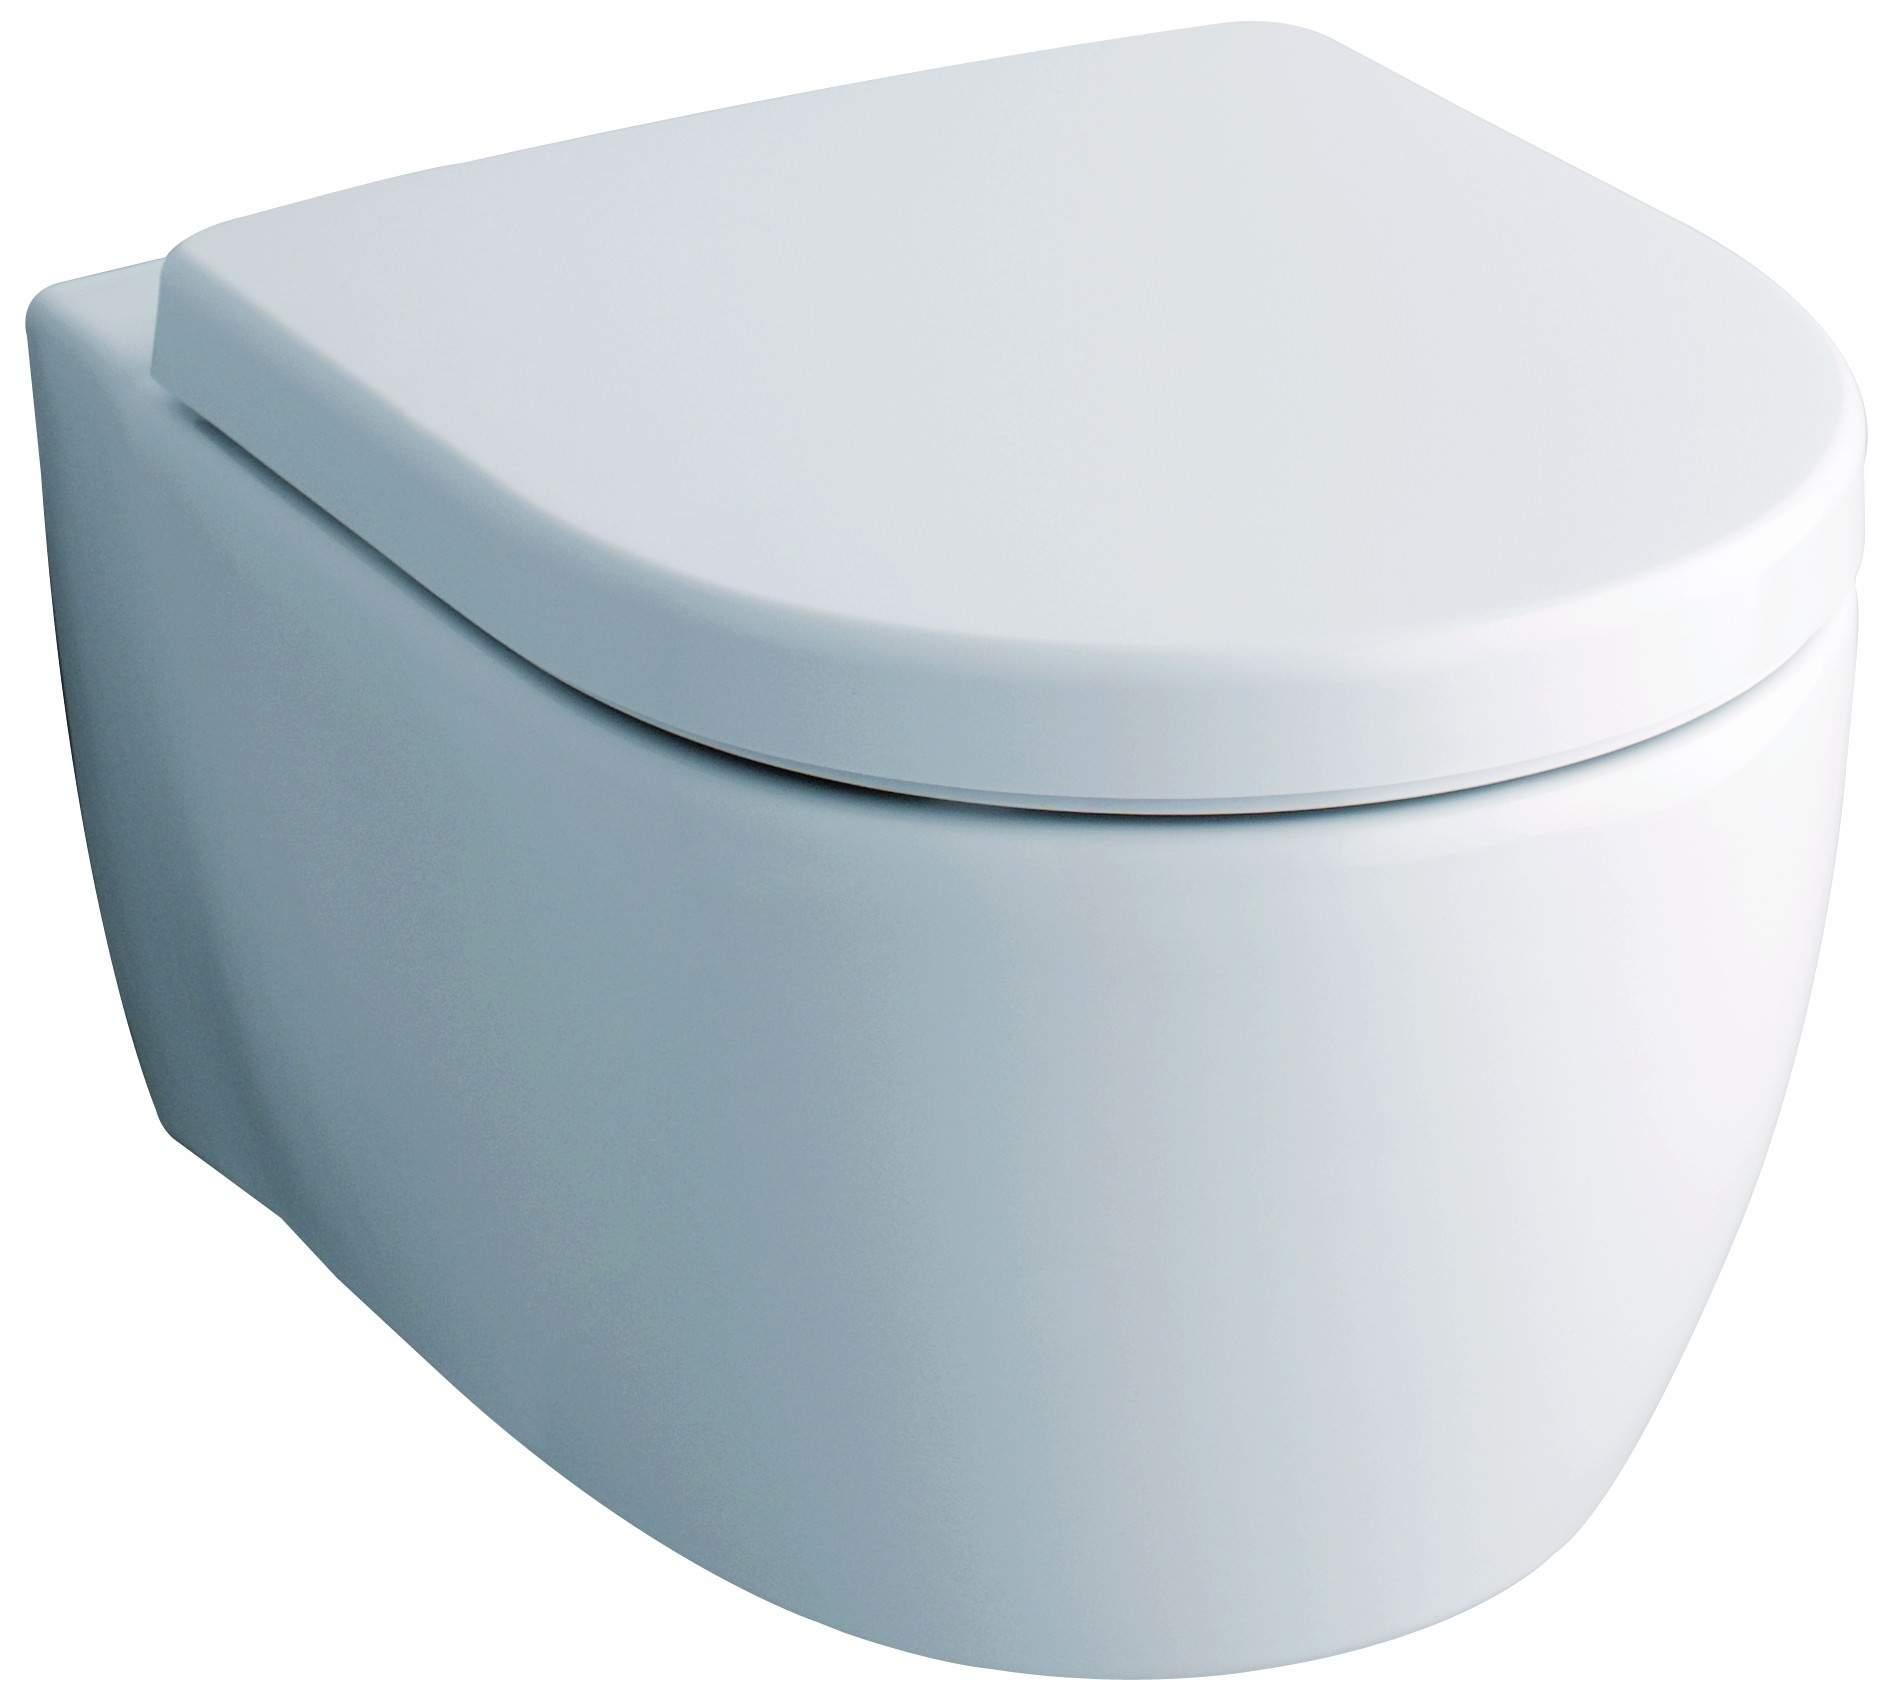 Keramag 2015 Kombination ICon Tiefspuel WC 6 Liter wandhaengend WC Sitz Absenkautomatik